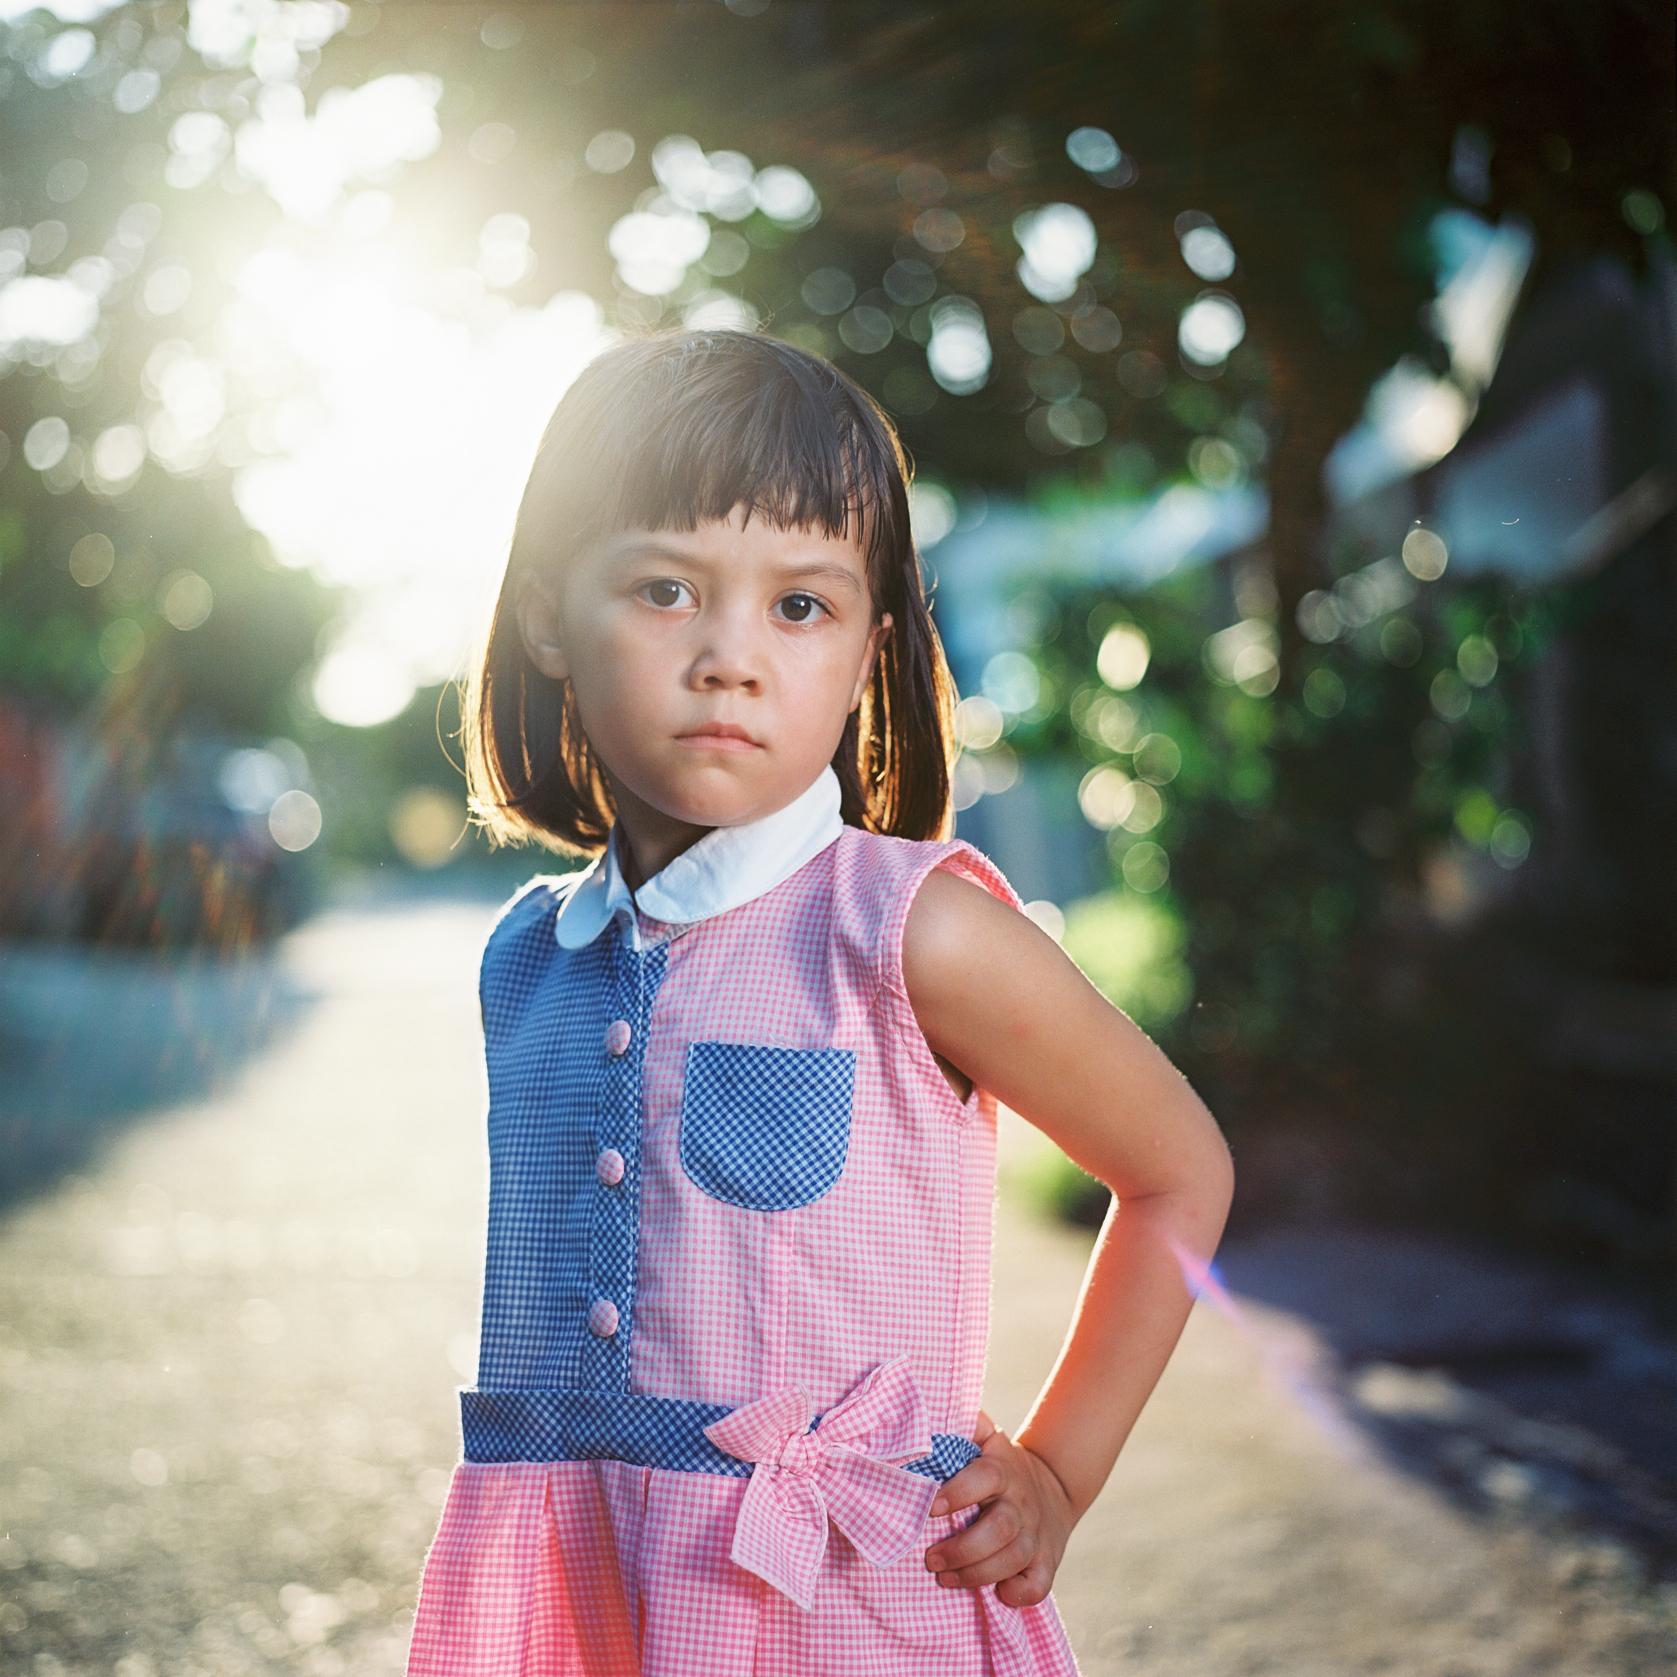 A serious girl, shot with a Hasselblad 500 c/m on Kodak Ektar 100.